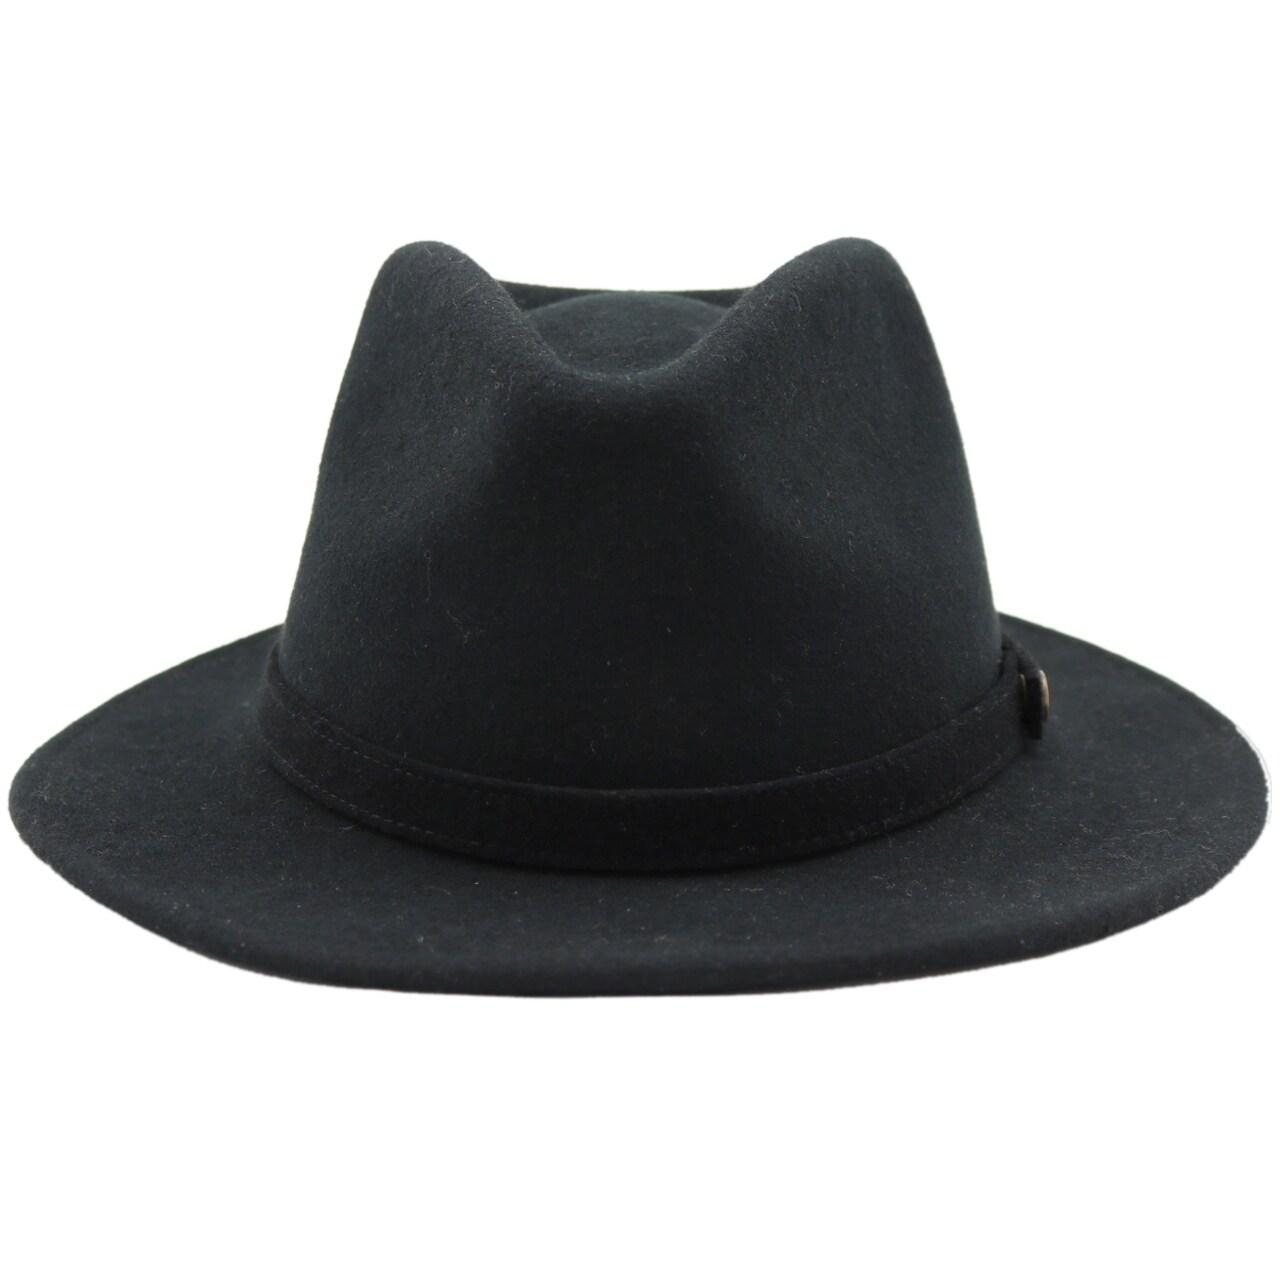 Shop Westly - 100% Wool Felt Modern-day Stiff Brim Fedora Style Felt Hat -  Free Shipping On Orders Over  45 - Overstock.com - 20743877 e35a06c8c84